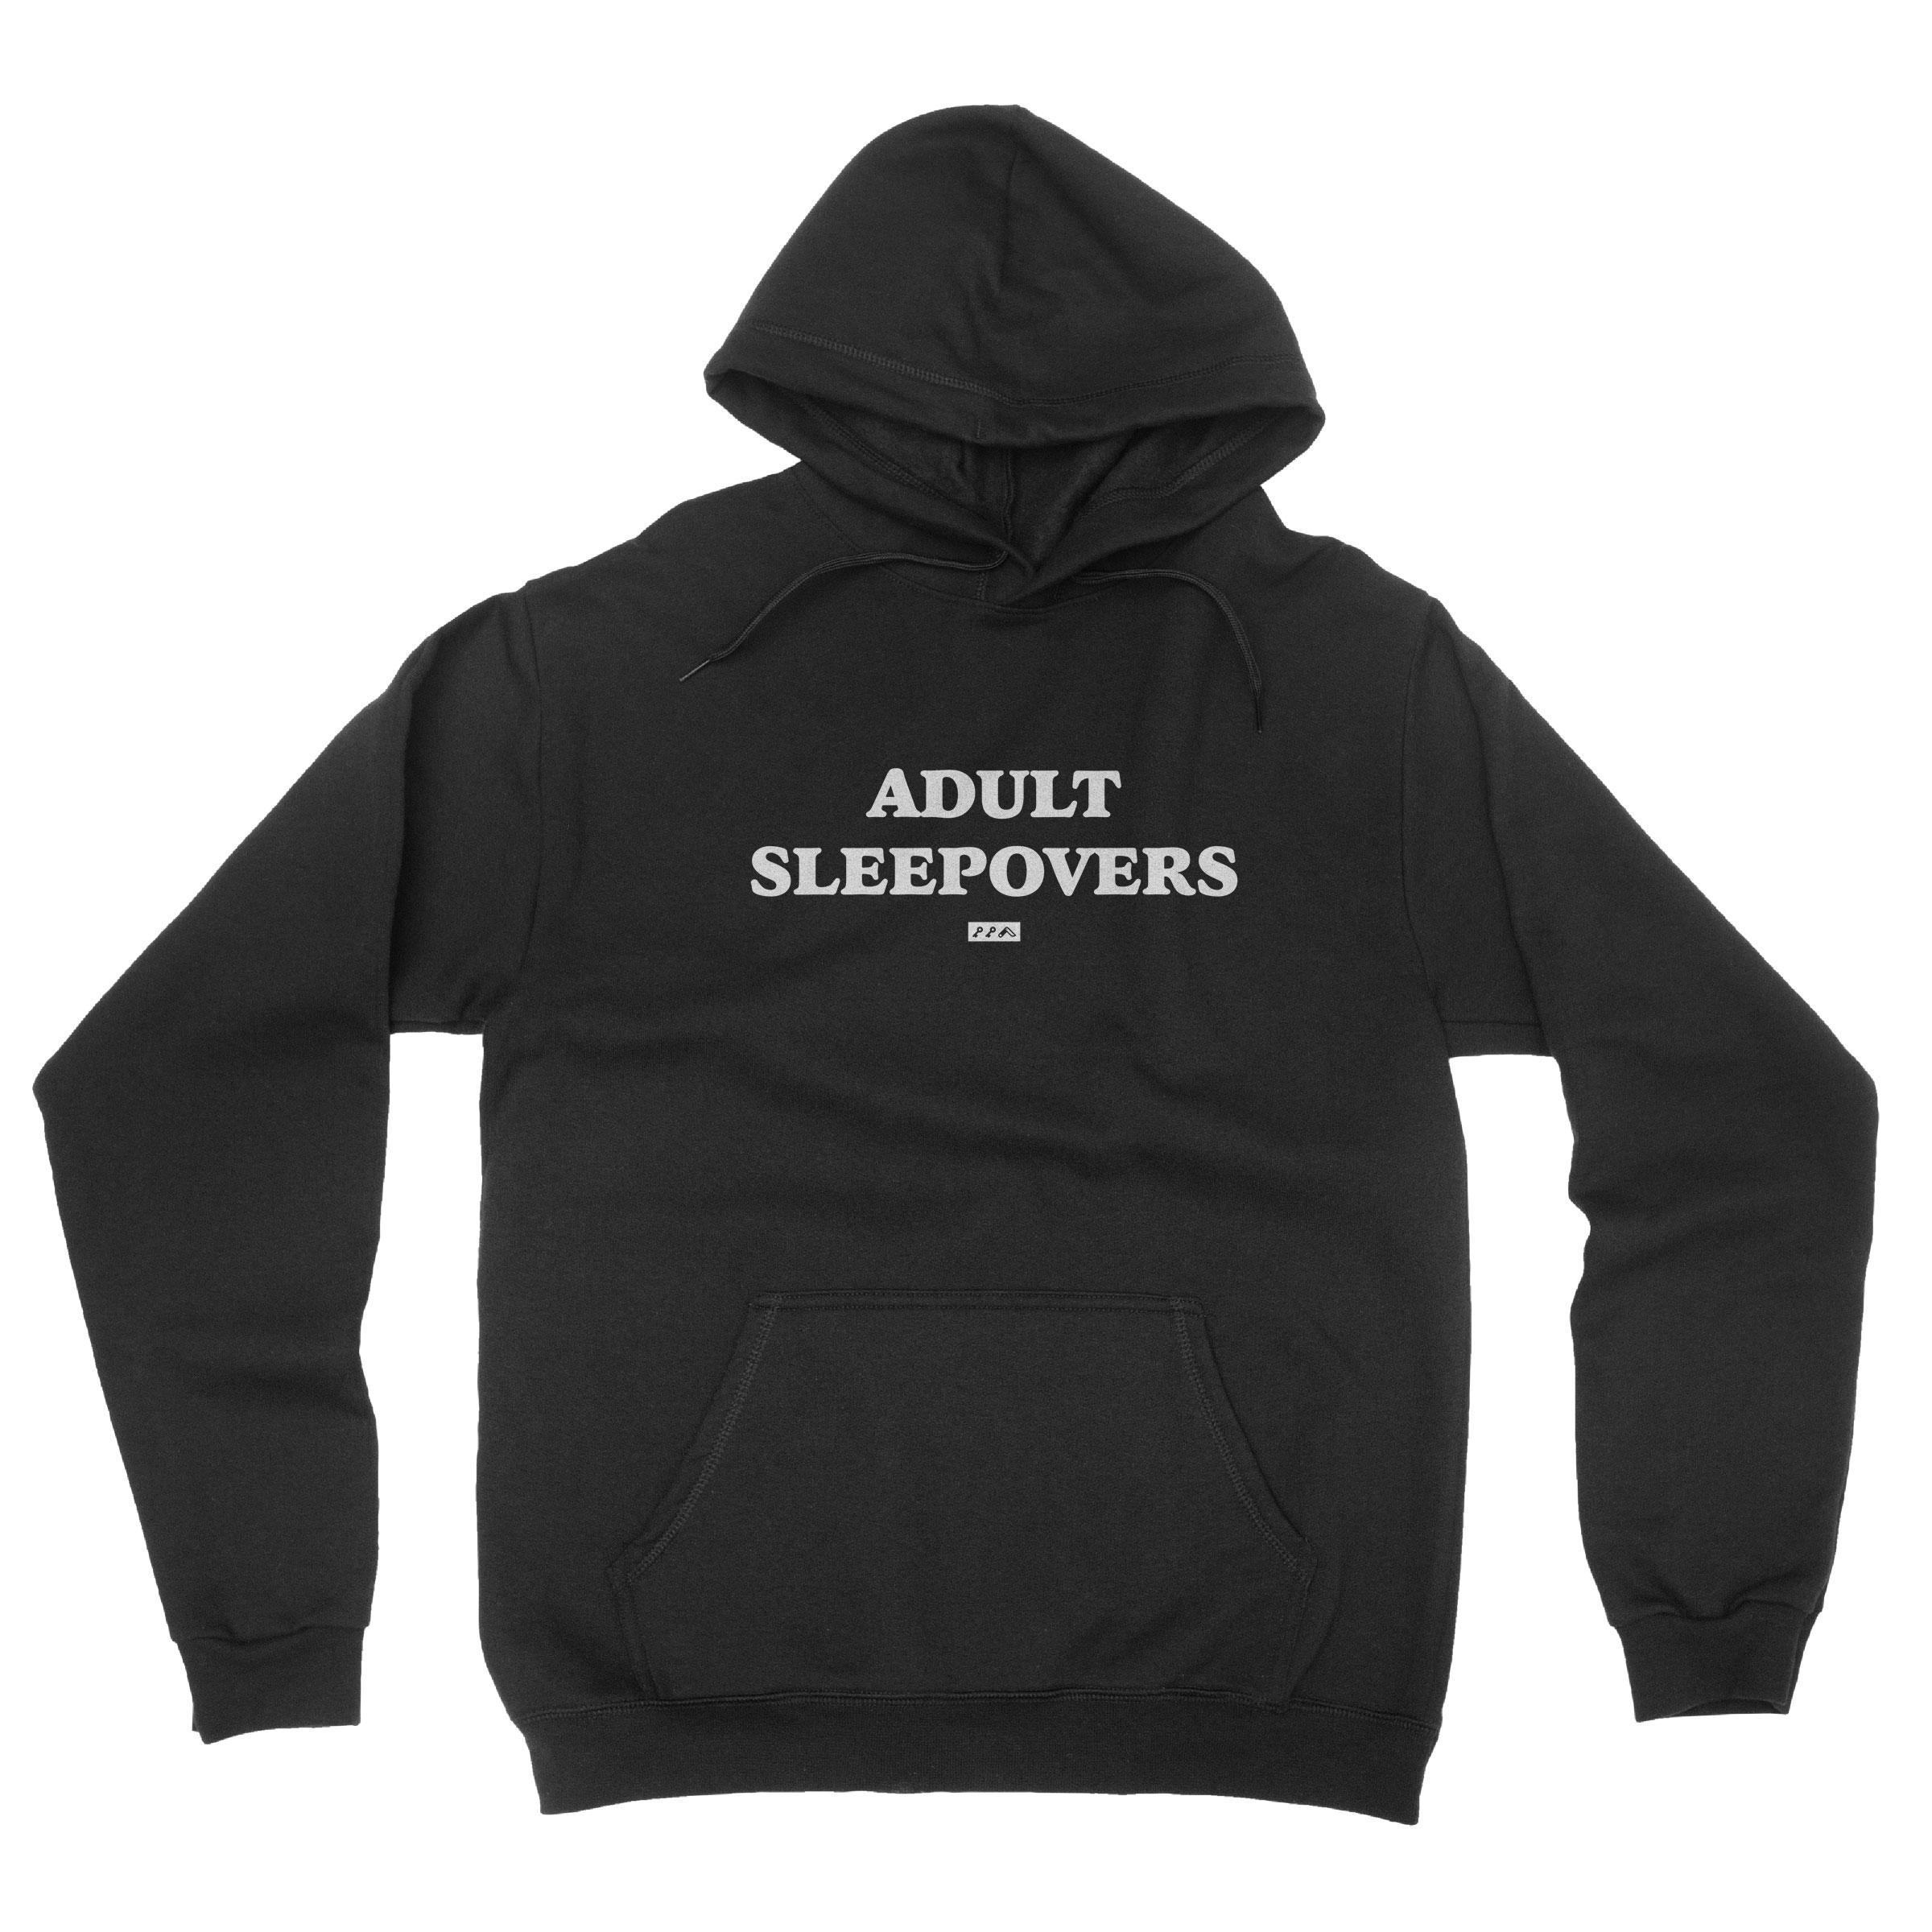 ADULT SLEEPOVERS funny adult hoodie sweatshirts in black